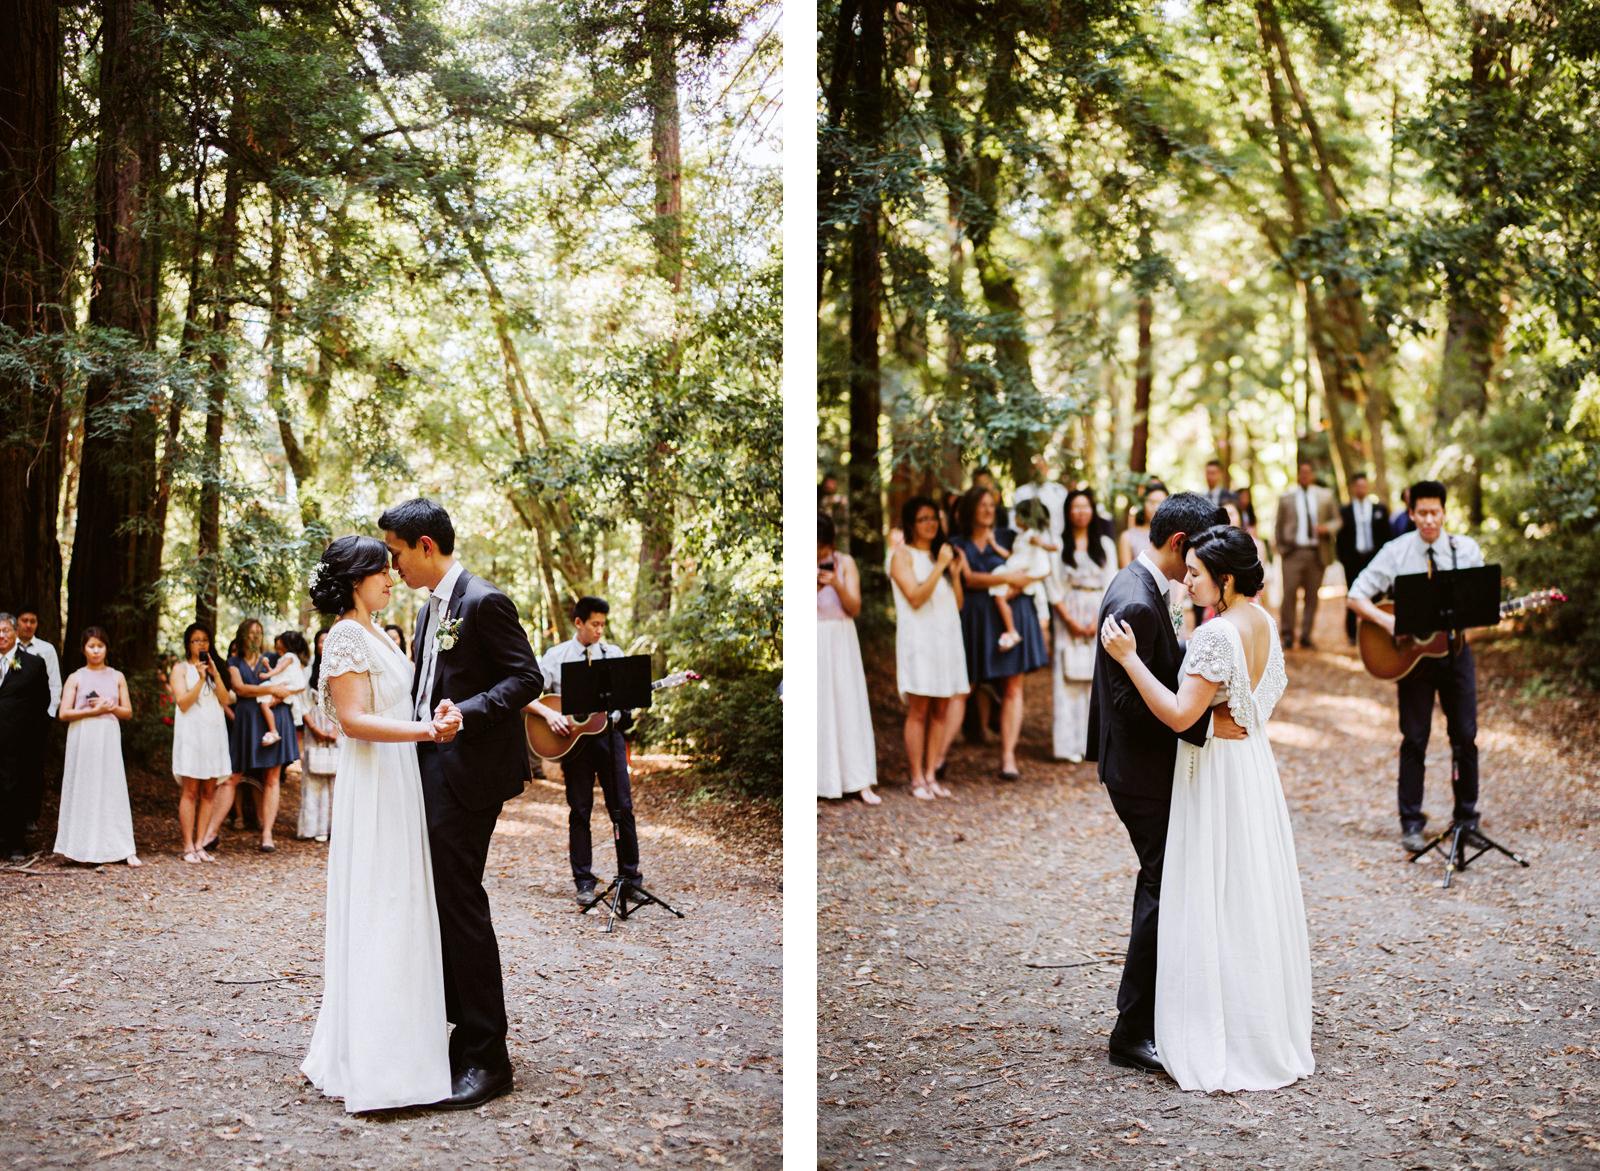 kimclay-blog-074 REDWOOD FOREST WEDDING